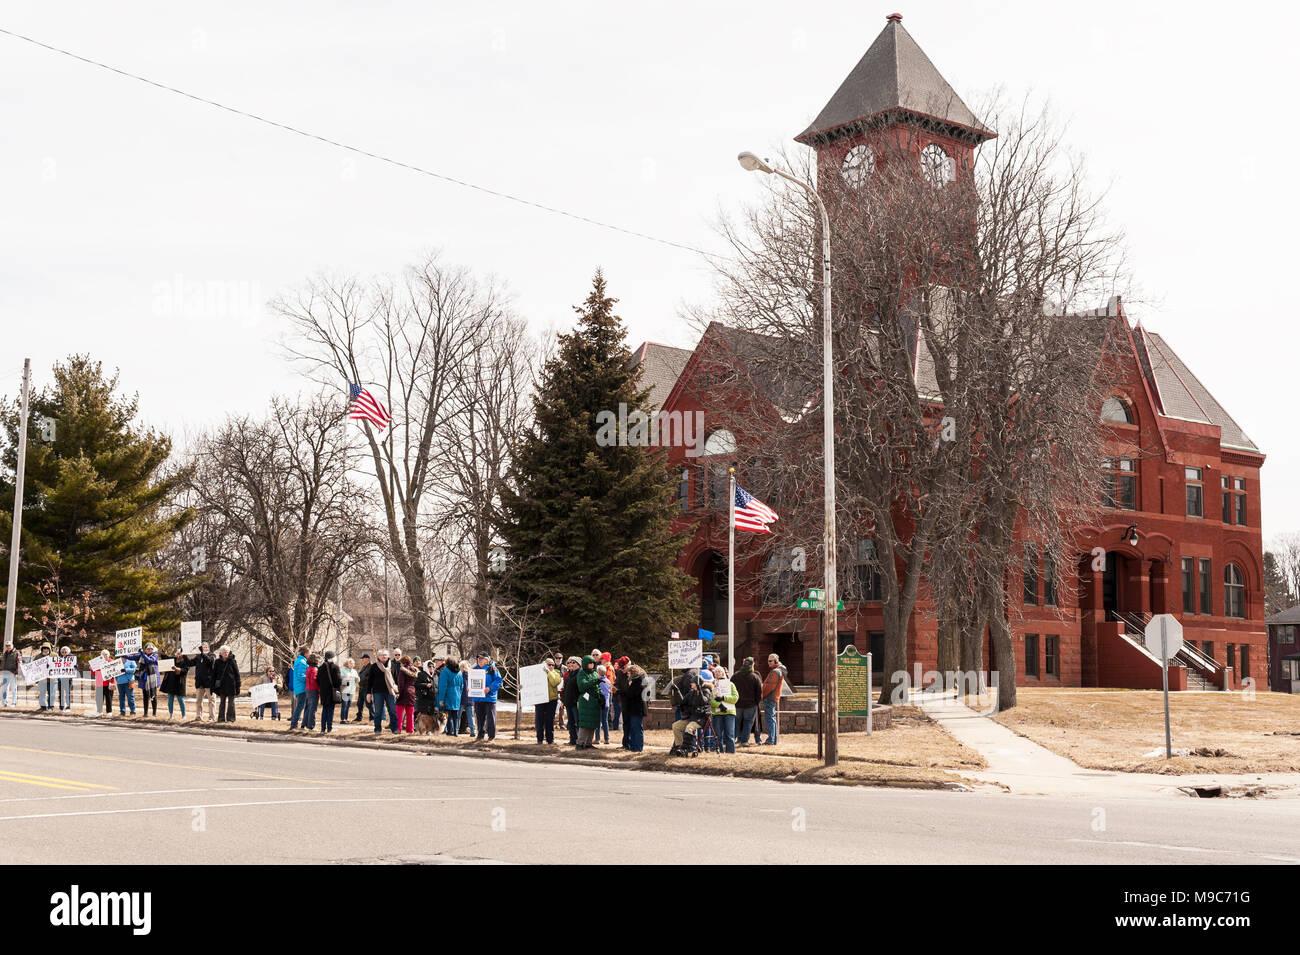 Douglas County Courthouse Stock Photos & Douglas County